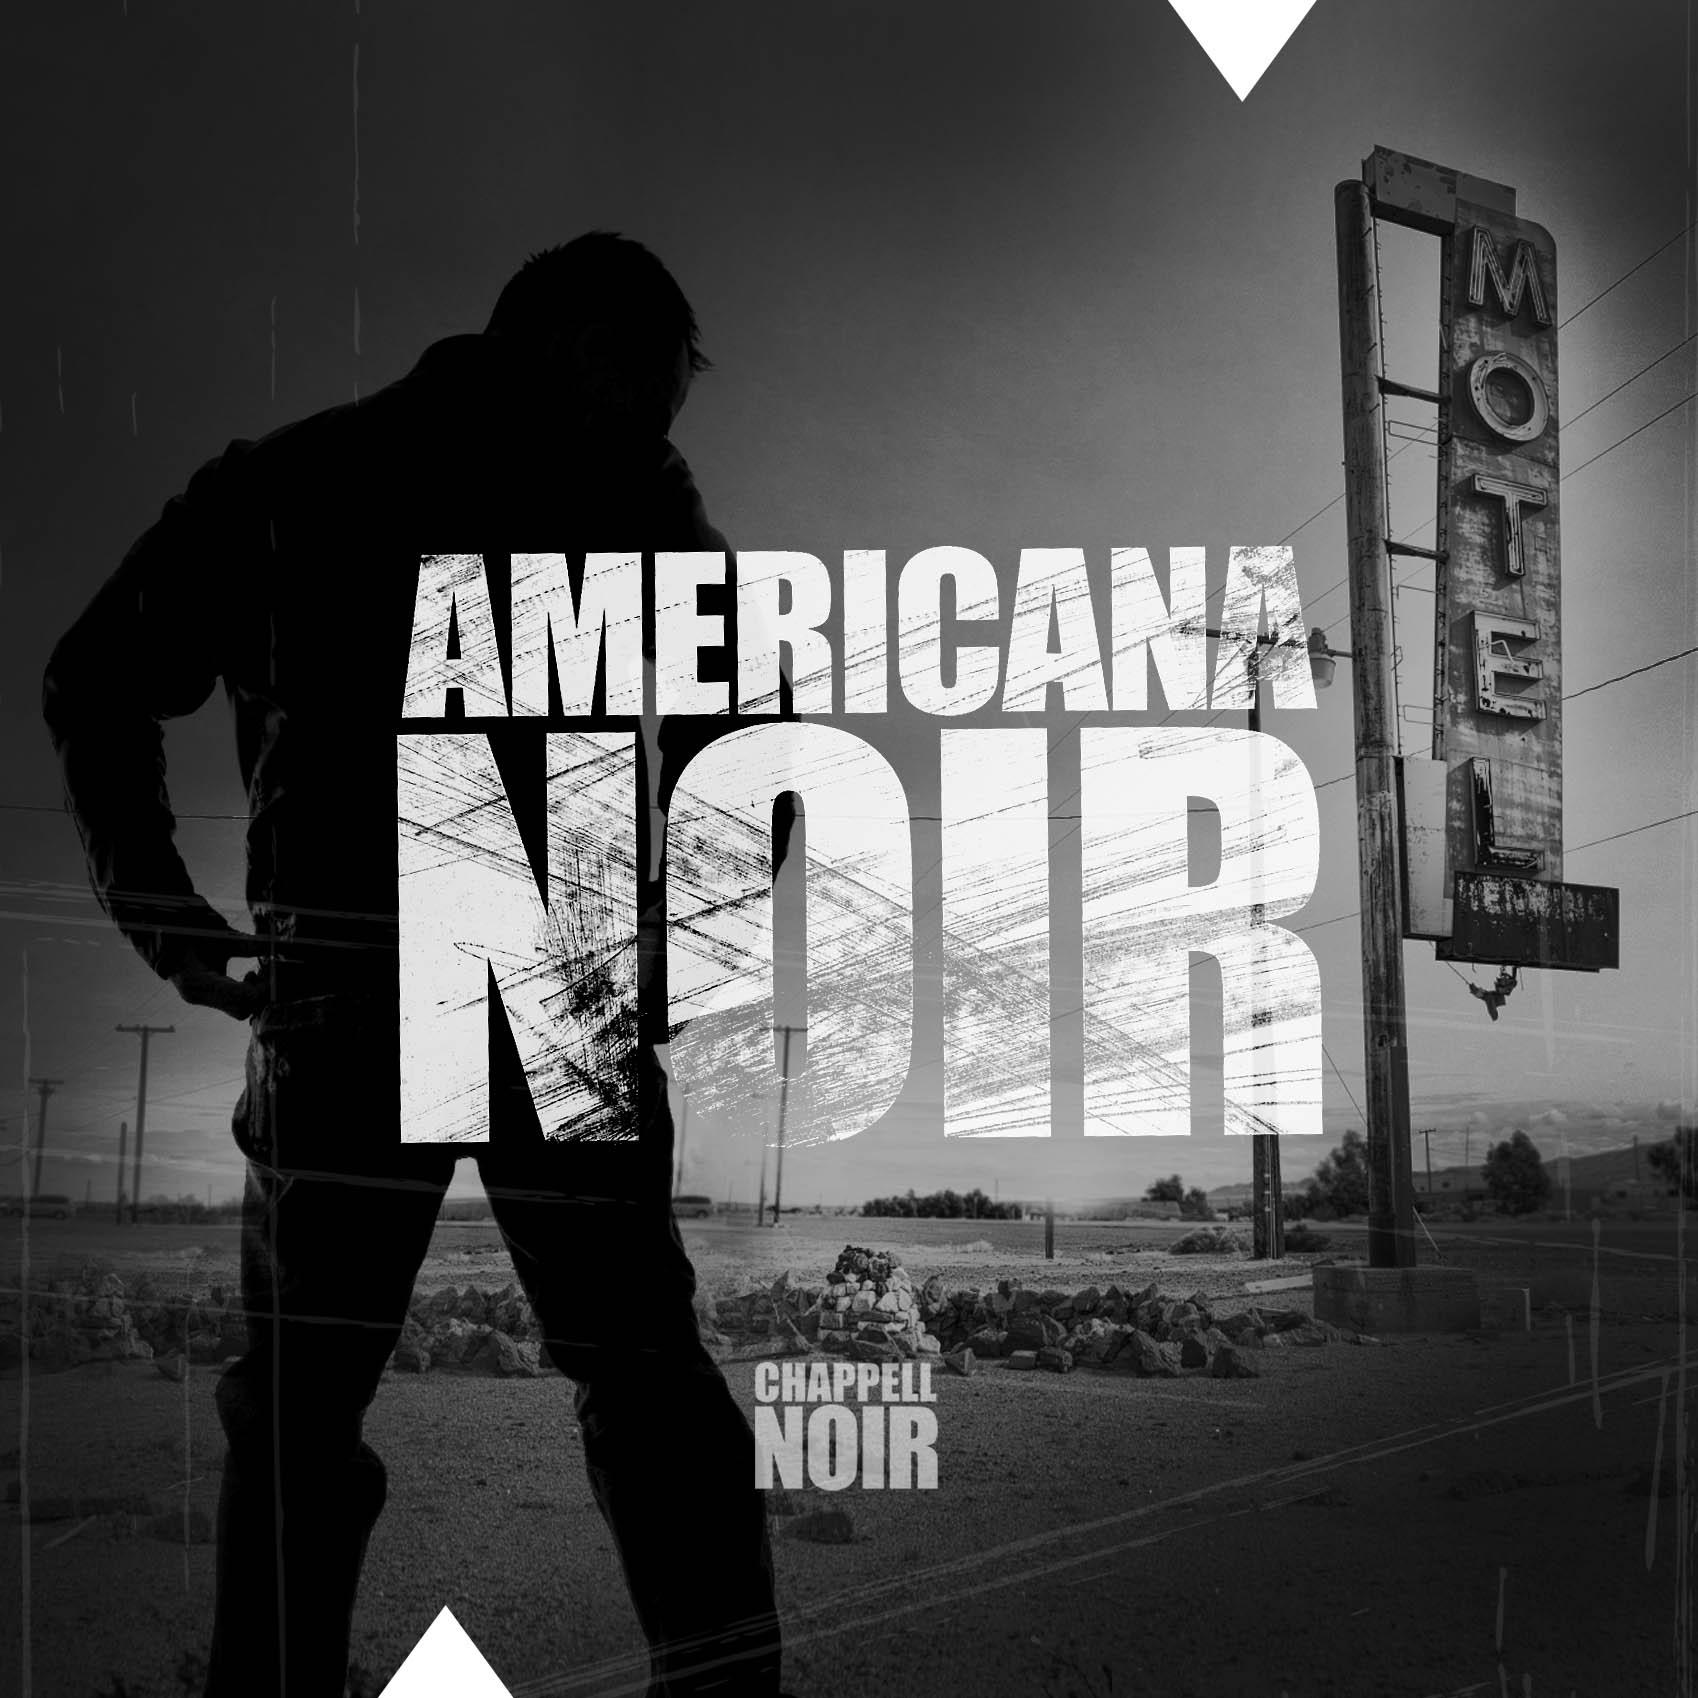 americananoir_repro